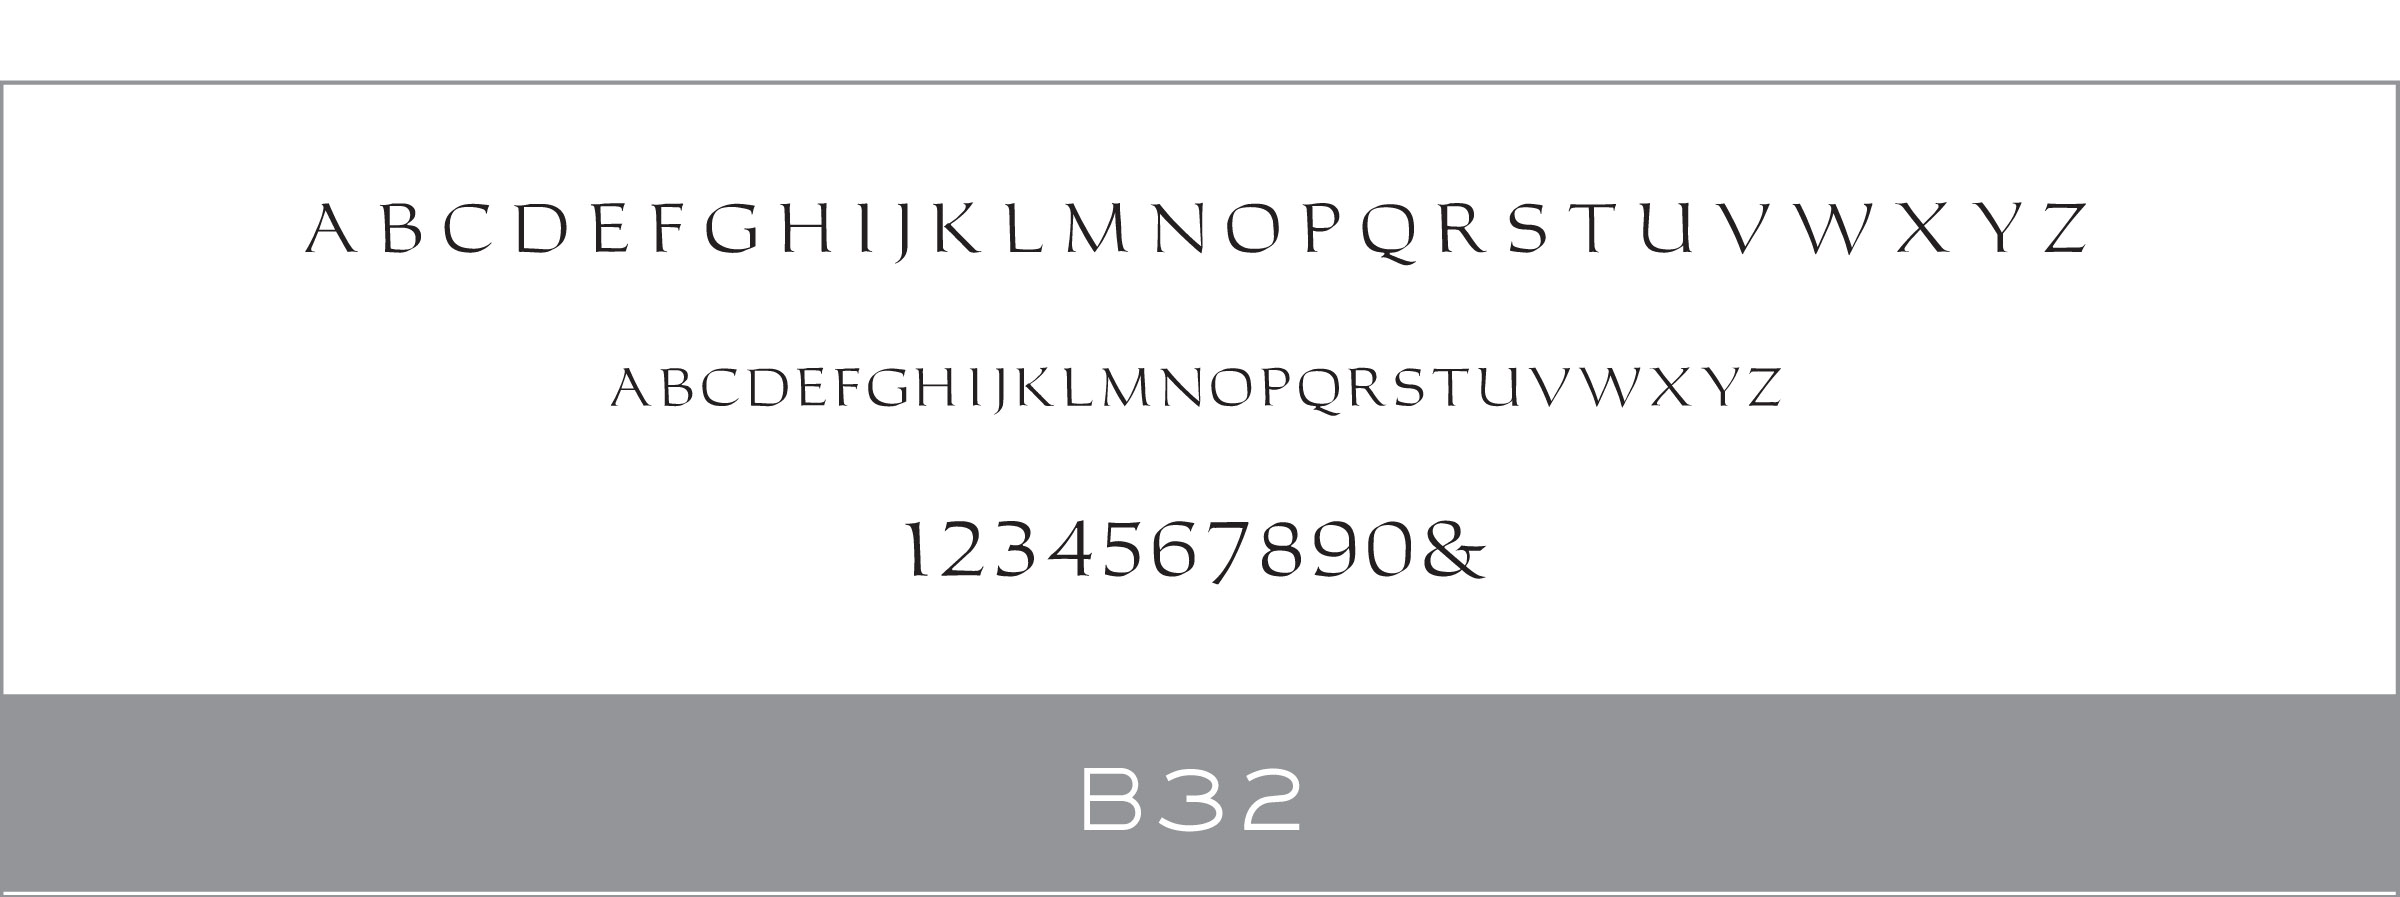 B32_Haute_Papier_Font.jpg